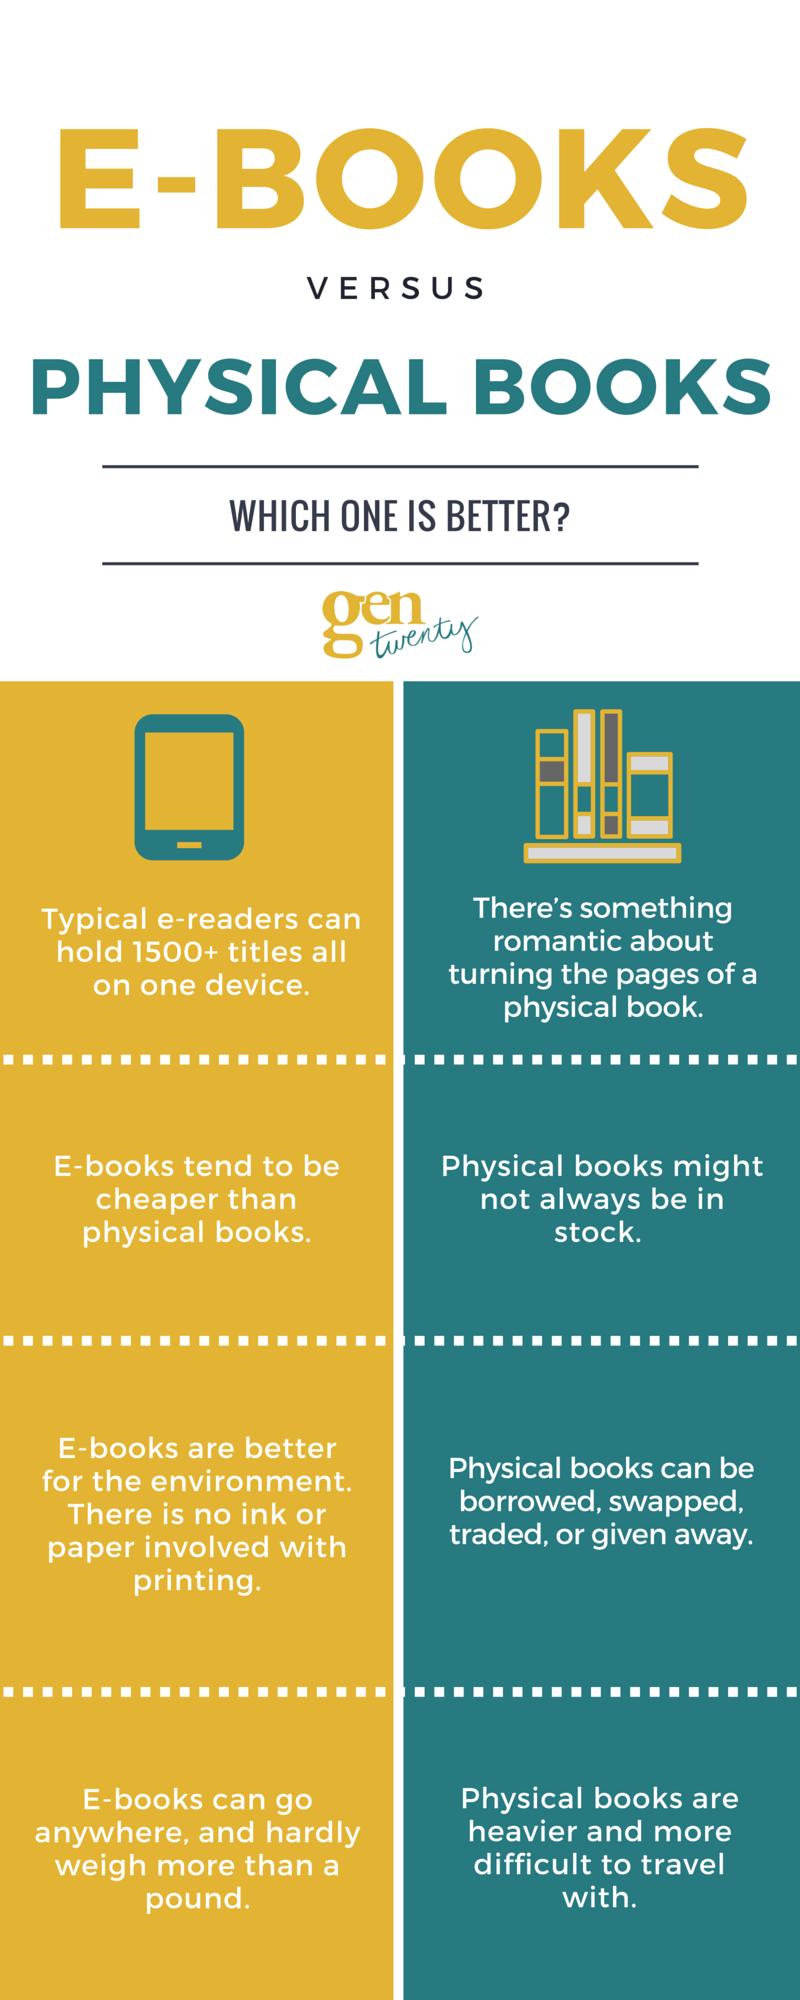 Kindle Vs Sony Reader: E-Readers Vs Physical Books: Who Wins The Showdown?